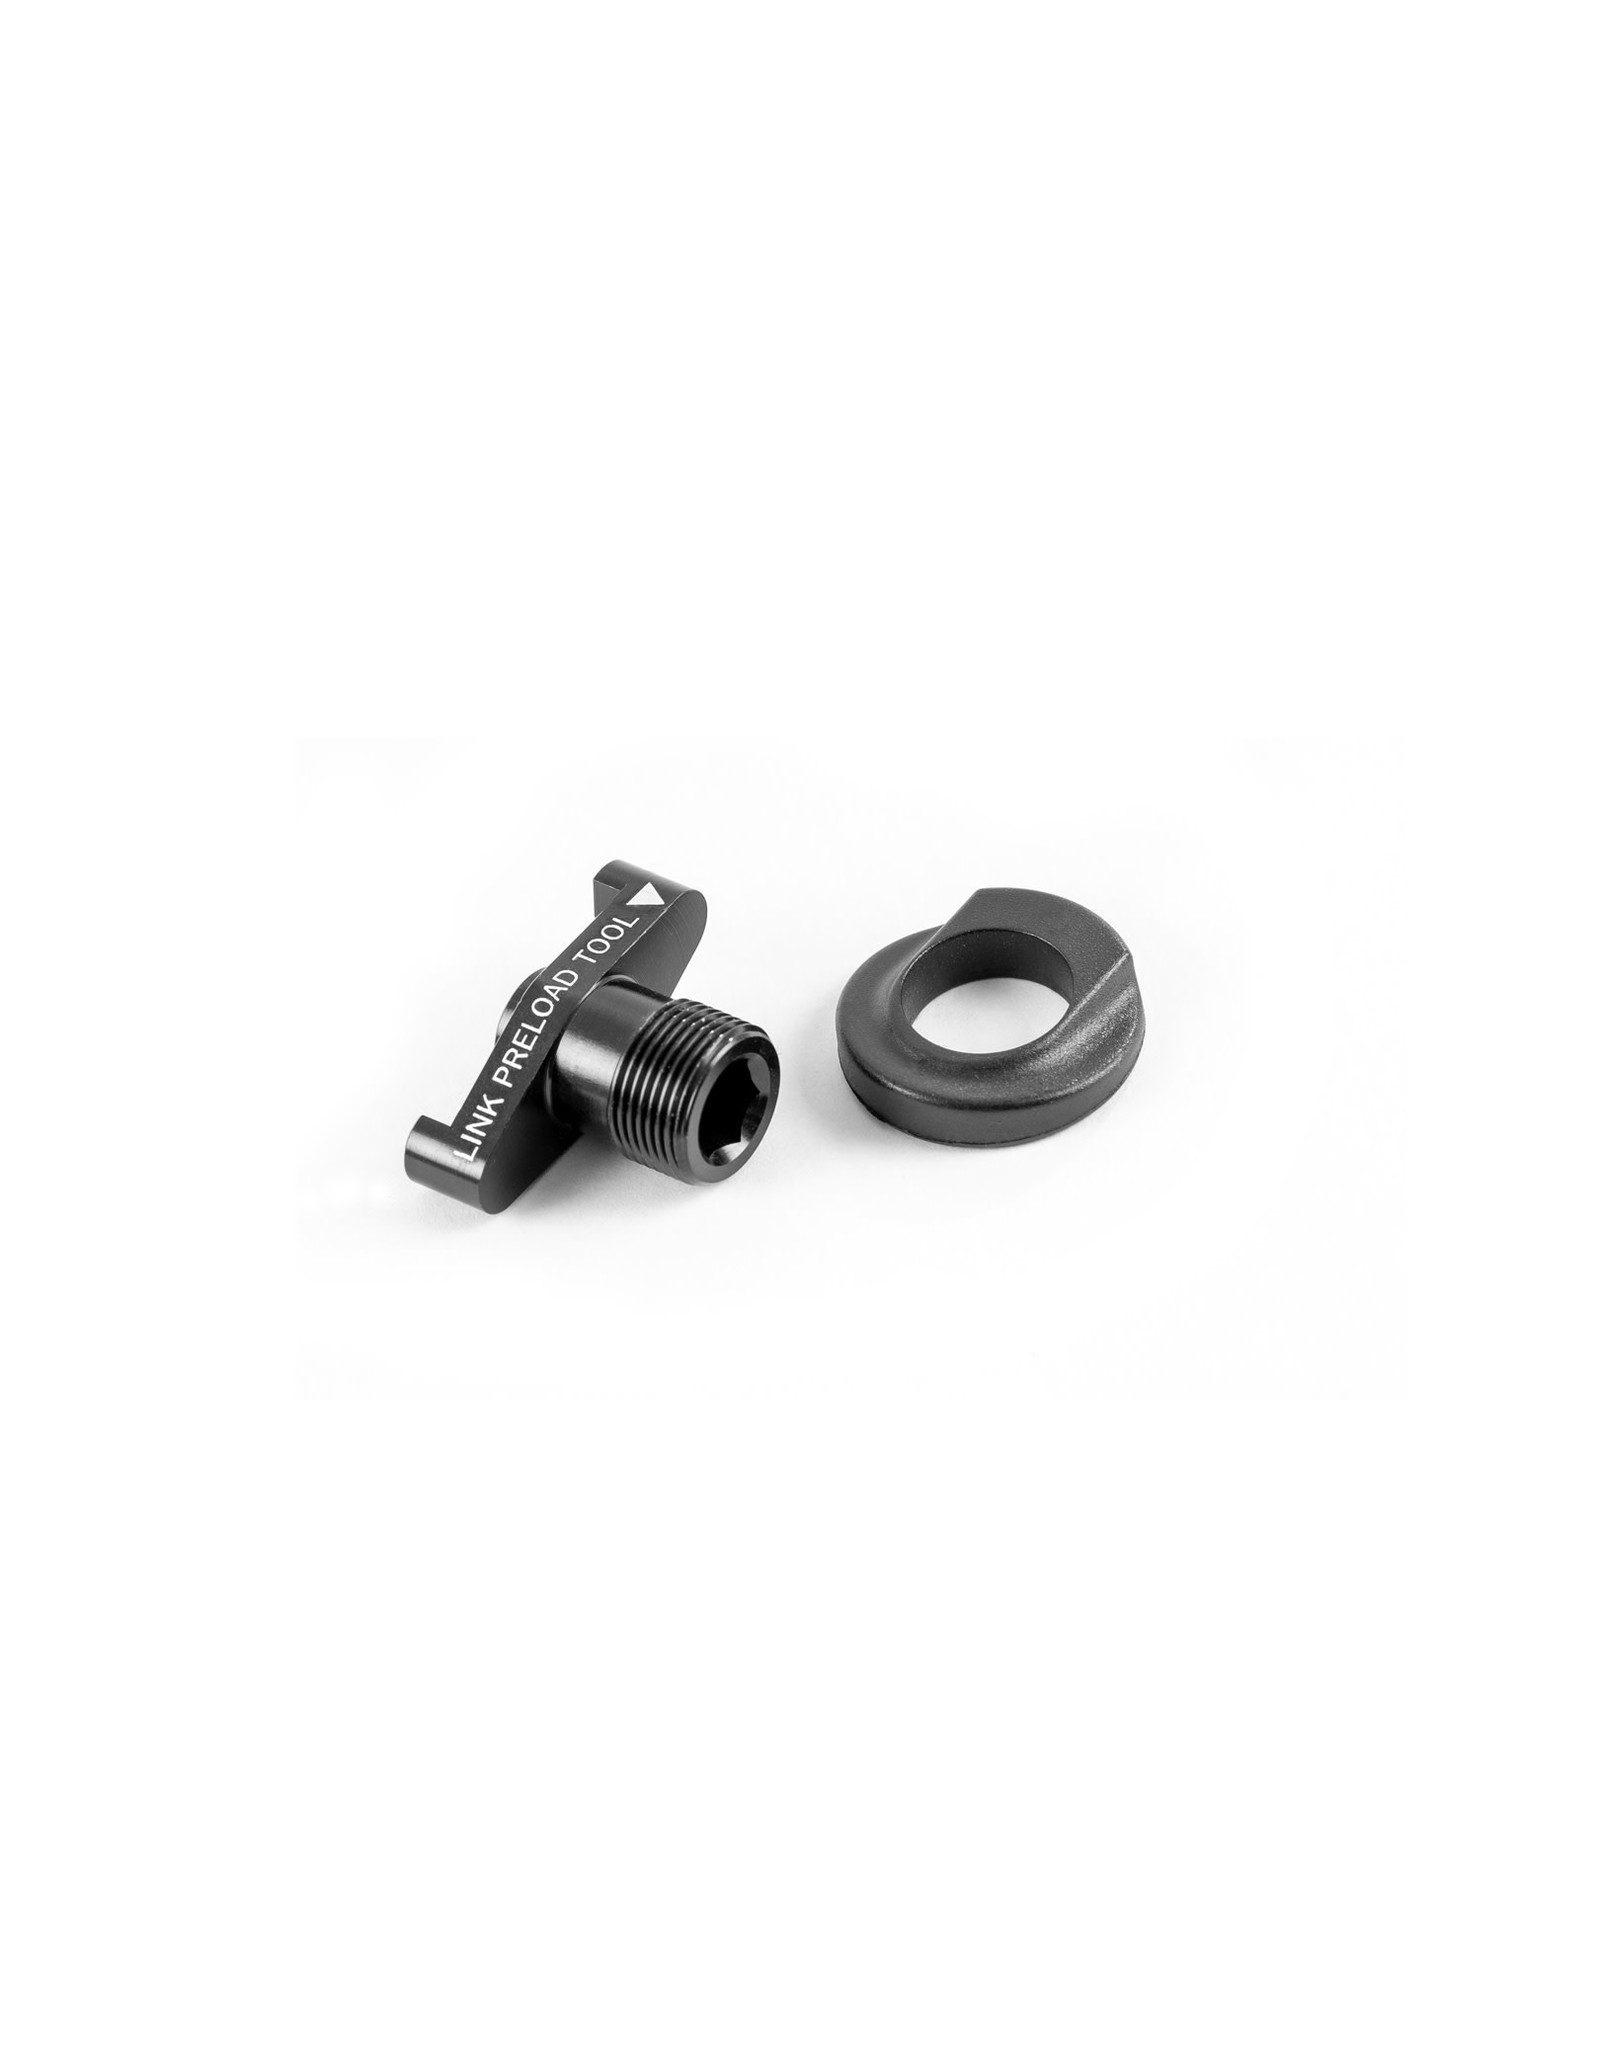 Orbea Preload tool SAG Orbea Rallon + washer (black)